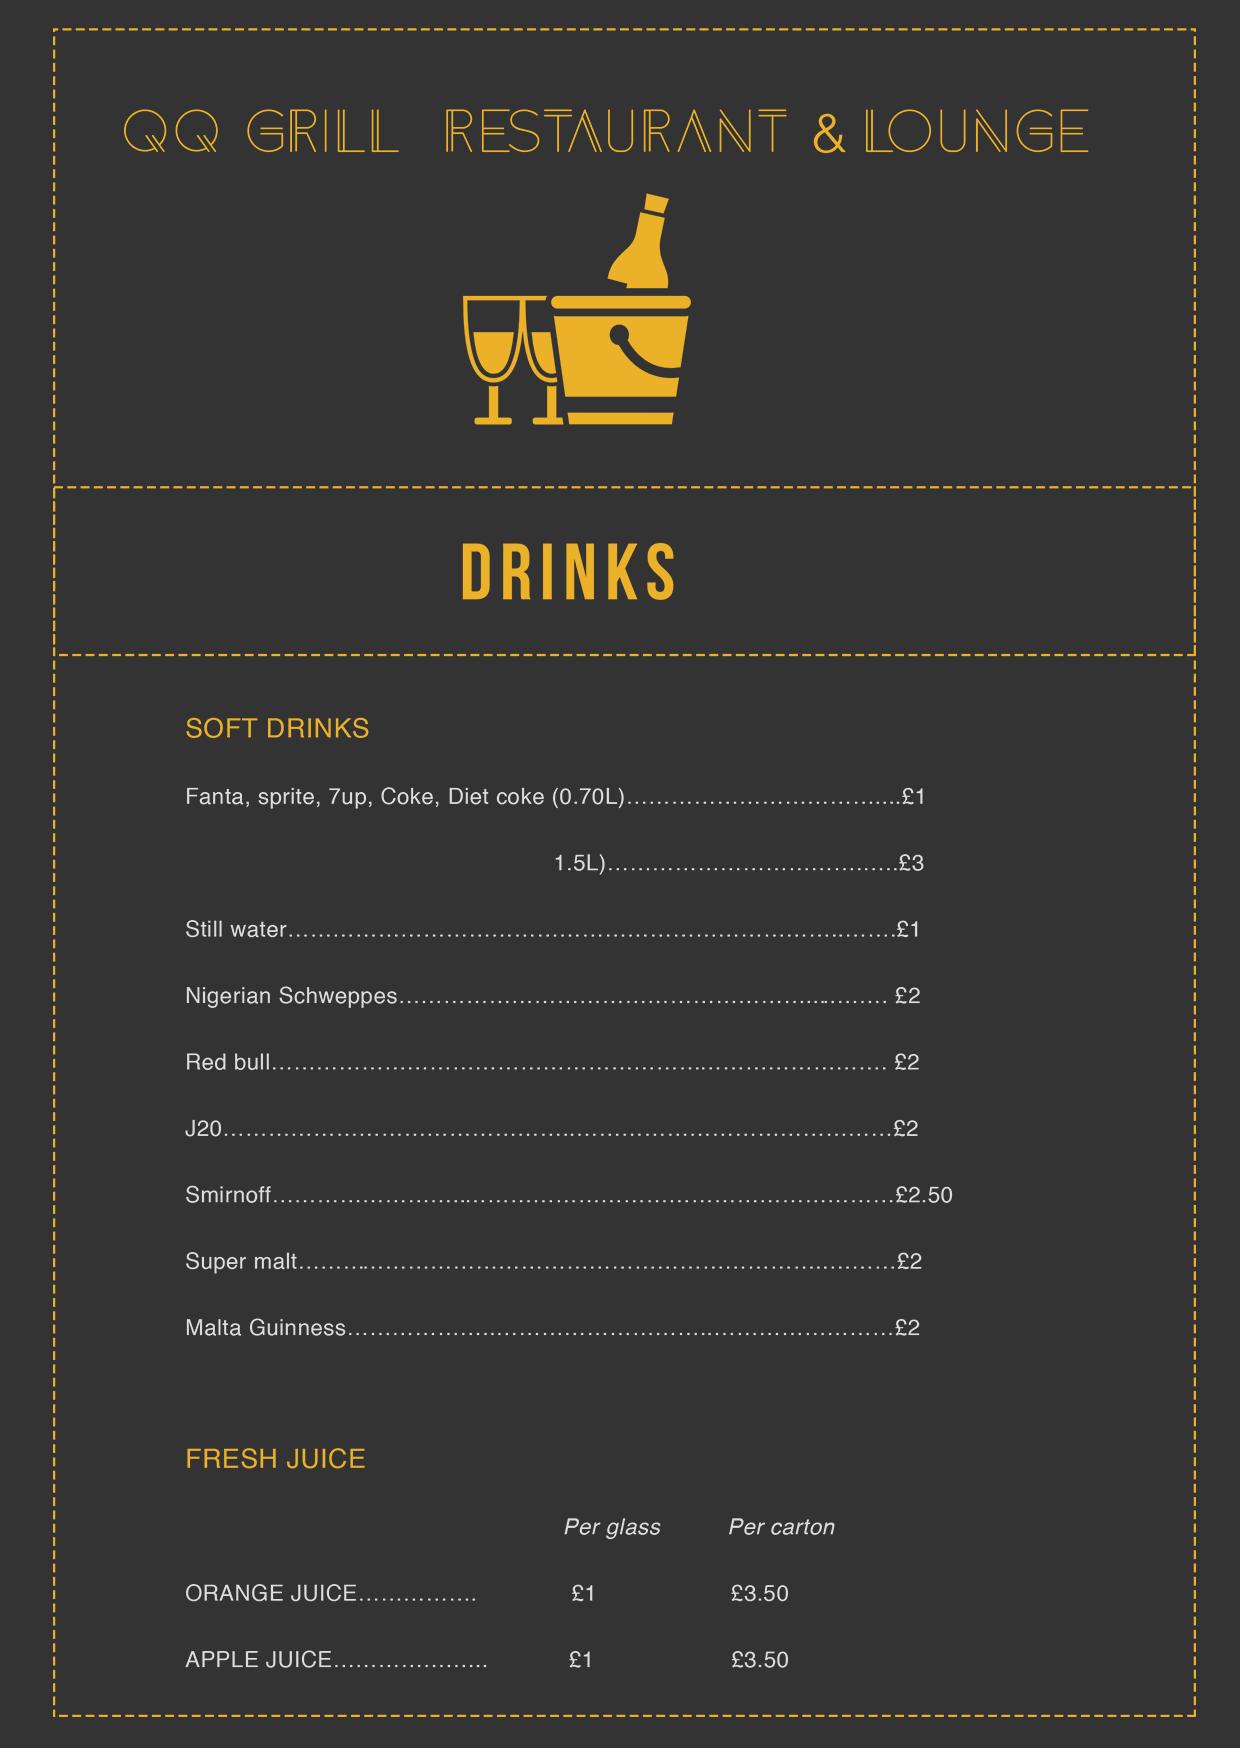 QQ Lounge drinks